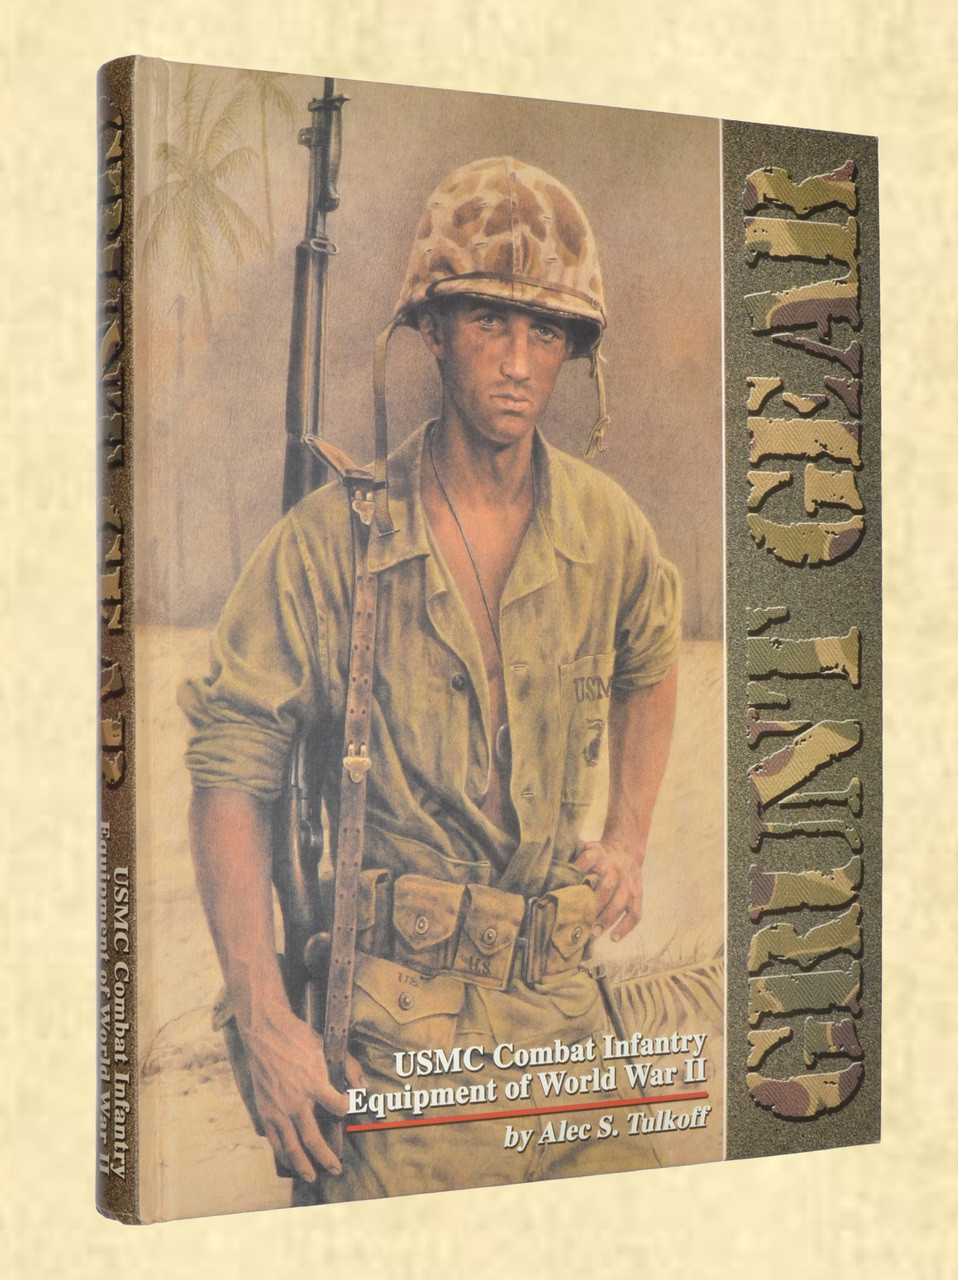 BOOK GRUNT GEAR USMC COMBAT INFANTRY - C42910